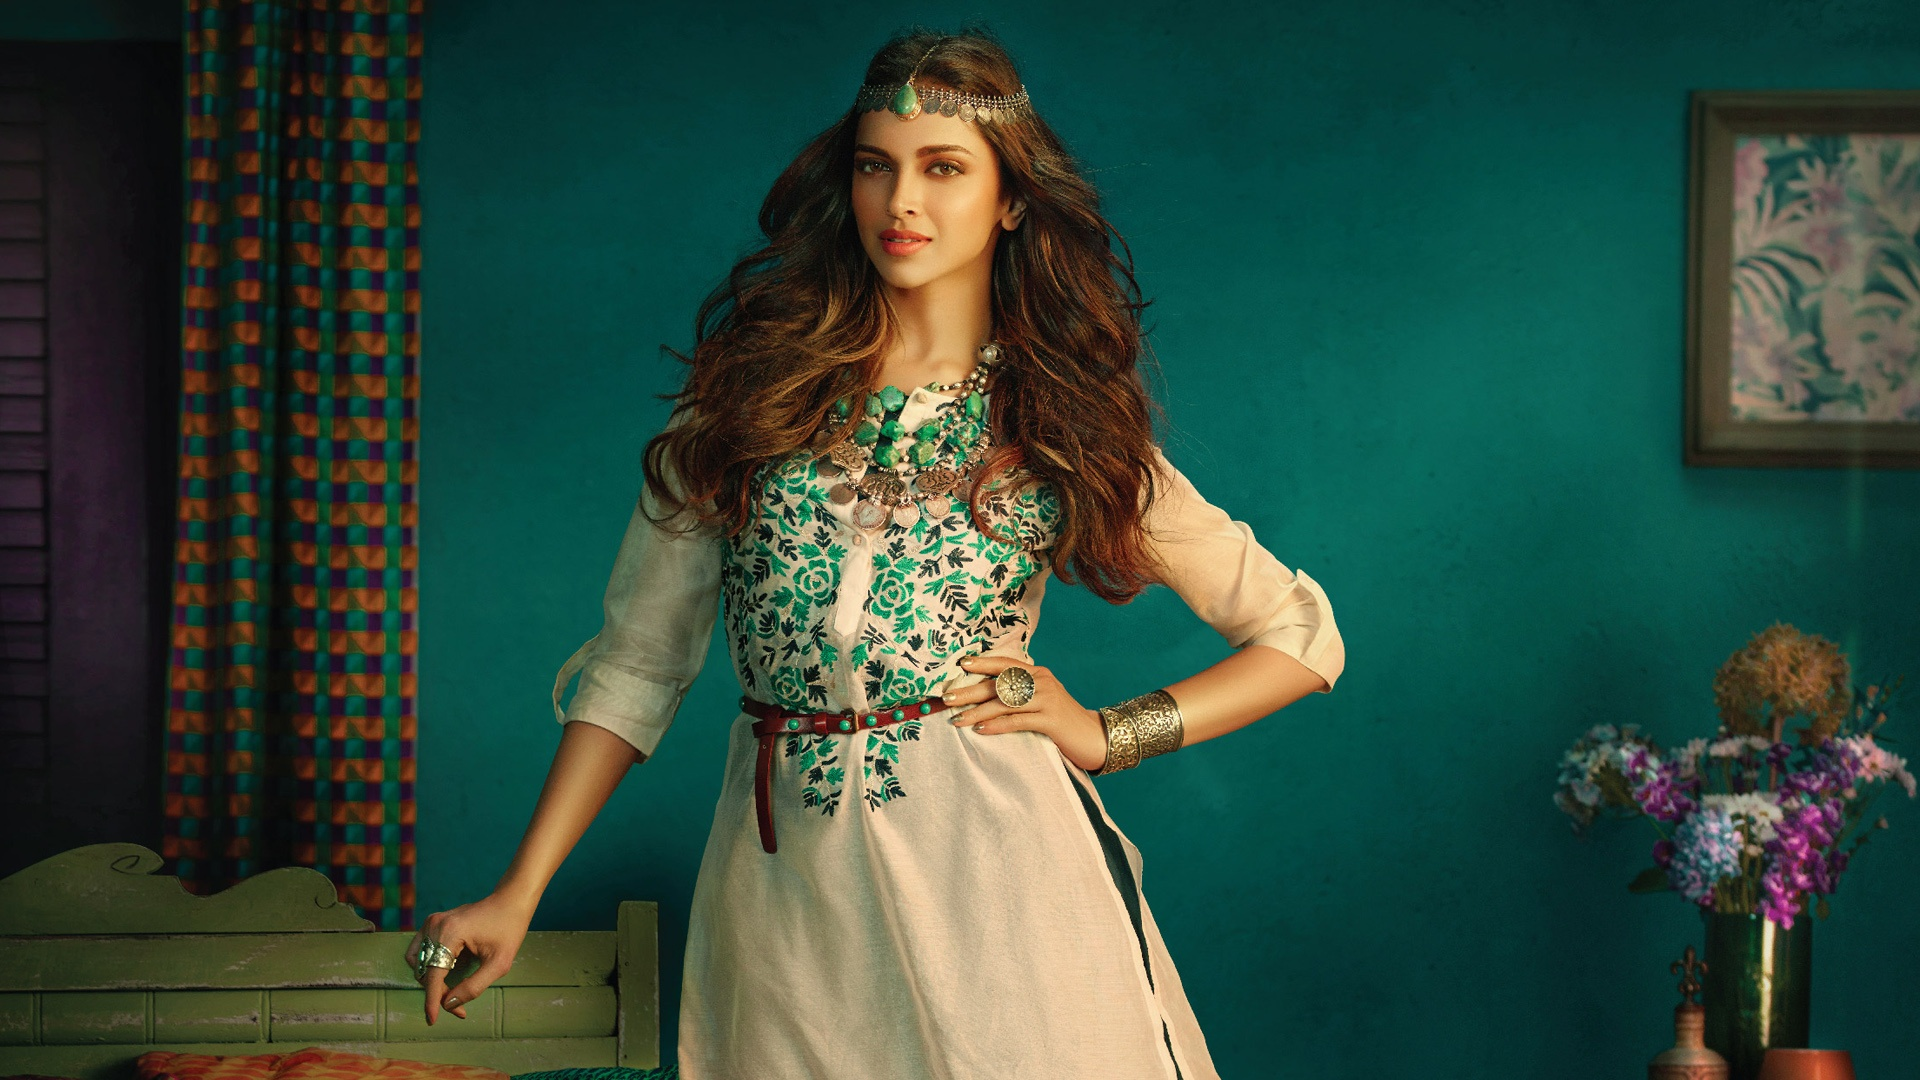 deepika padukone wallpaper actress